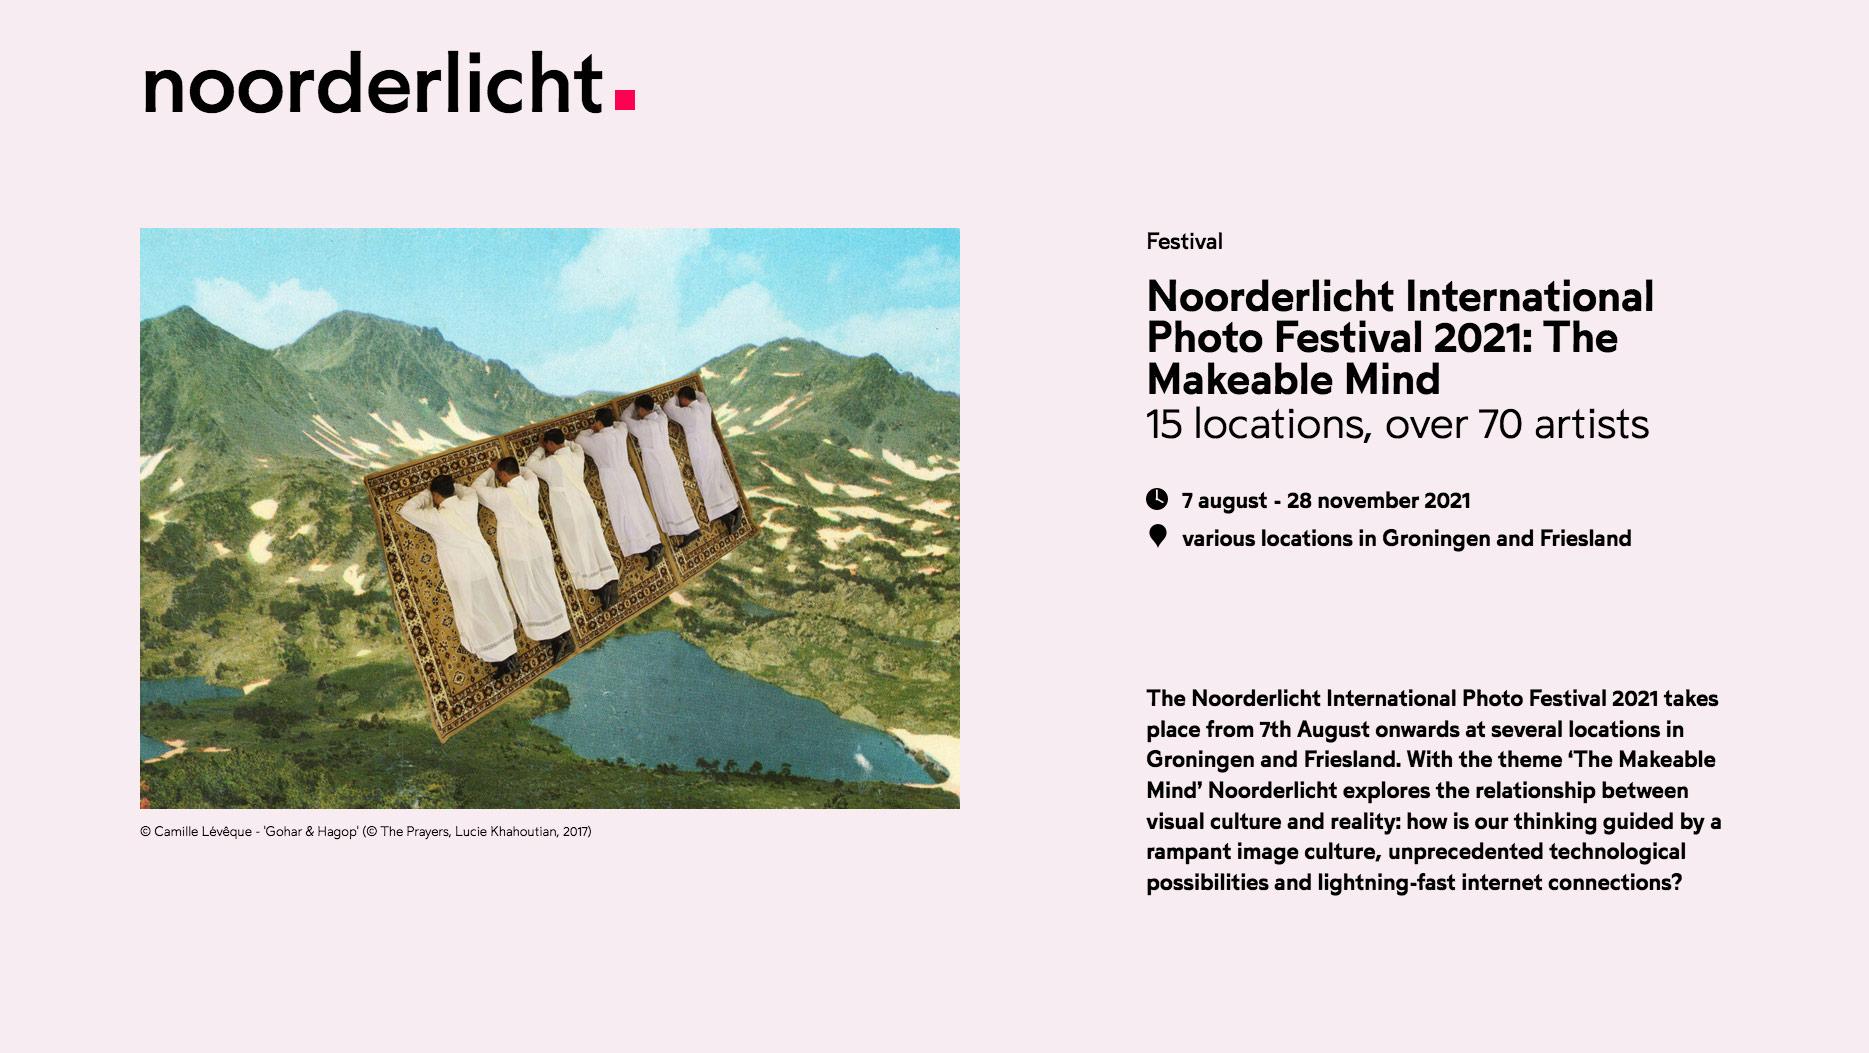 Noorderlicht International Photo Festival - Ewa Doroszenko